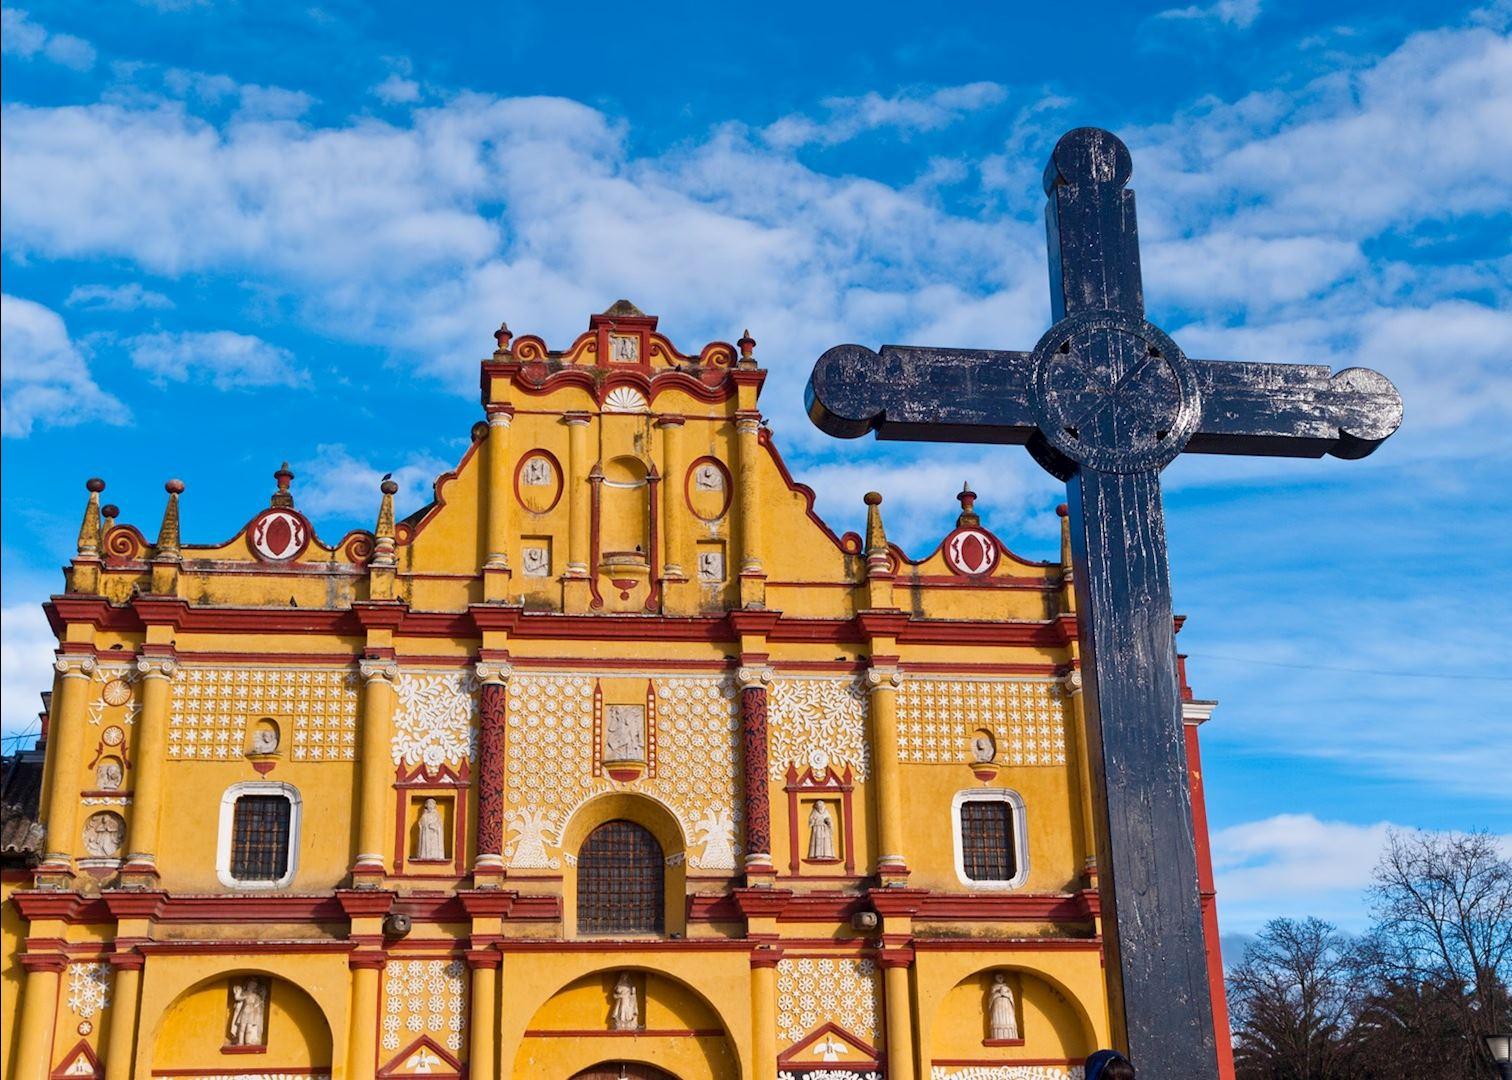 Visit San Cristobal de las Casas Mexico  Audley Travel